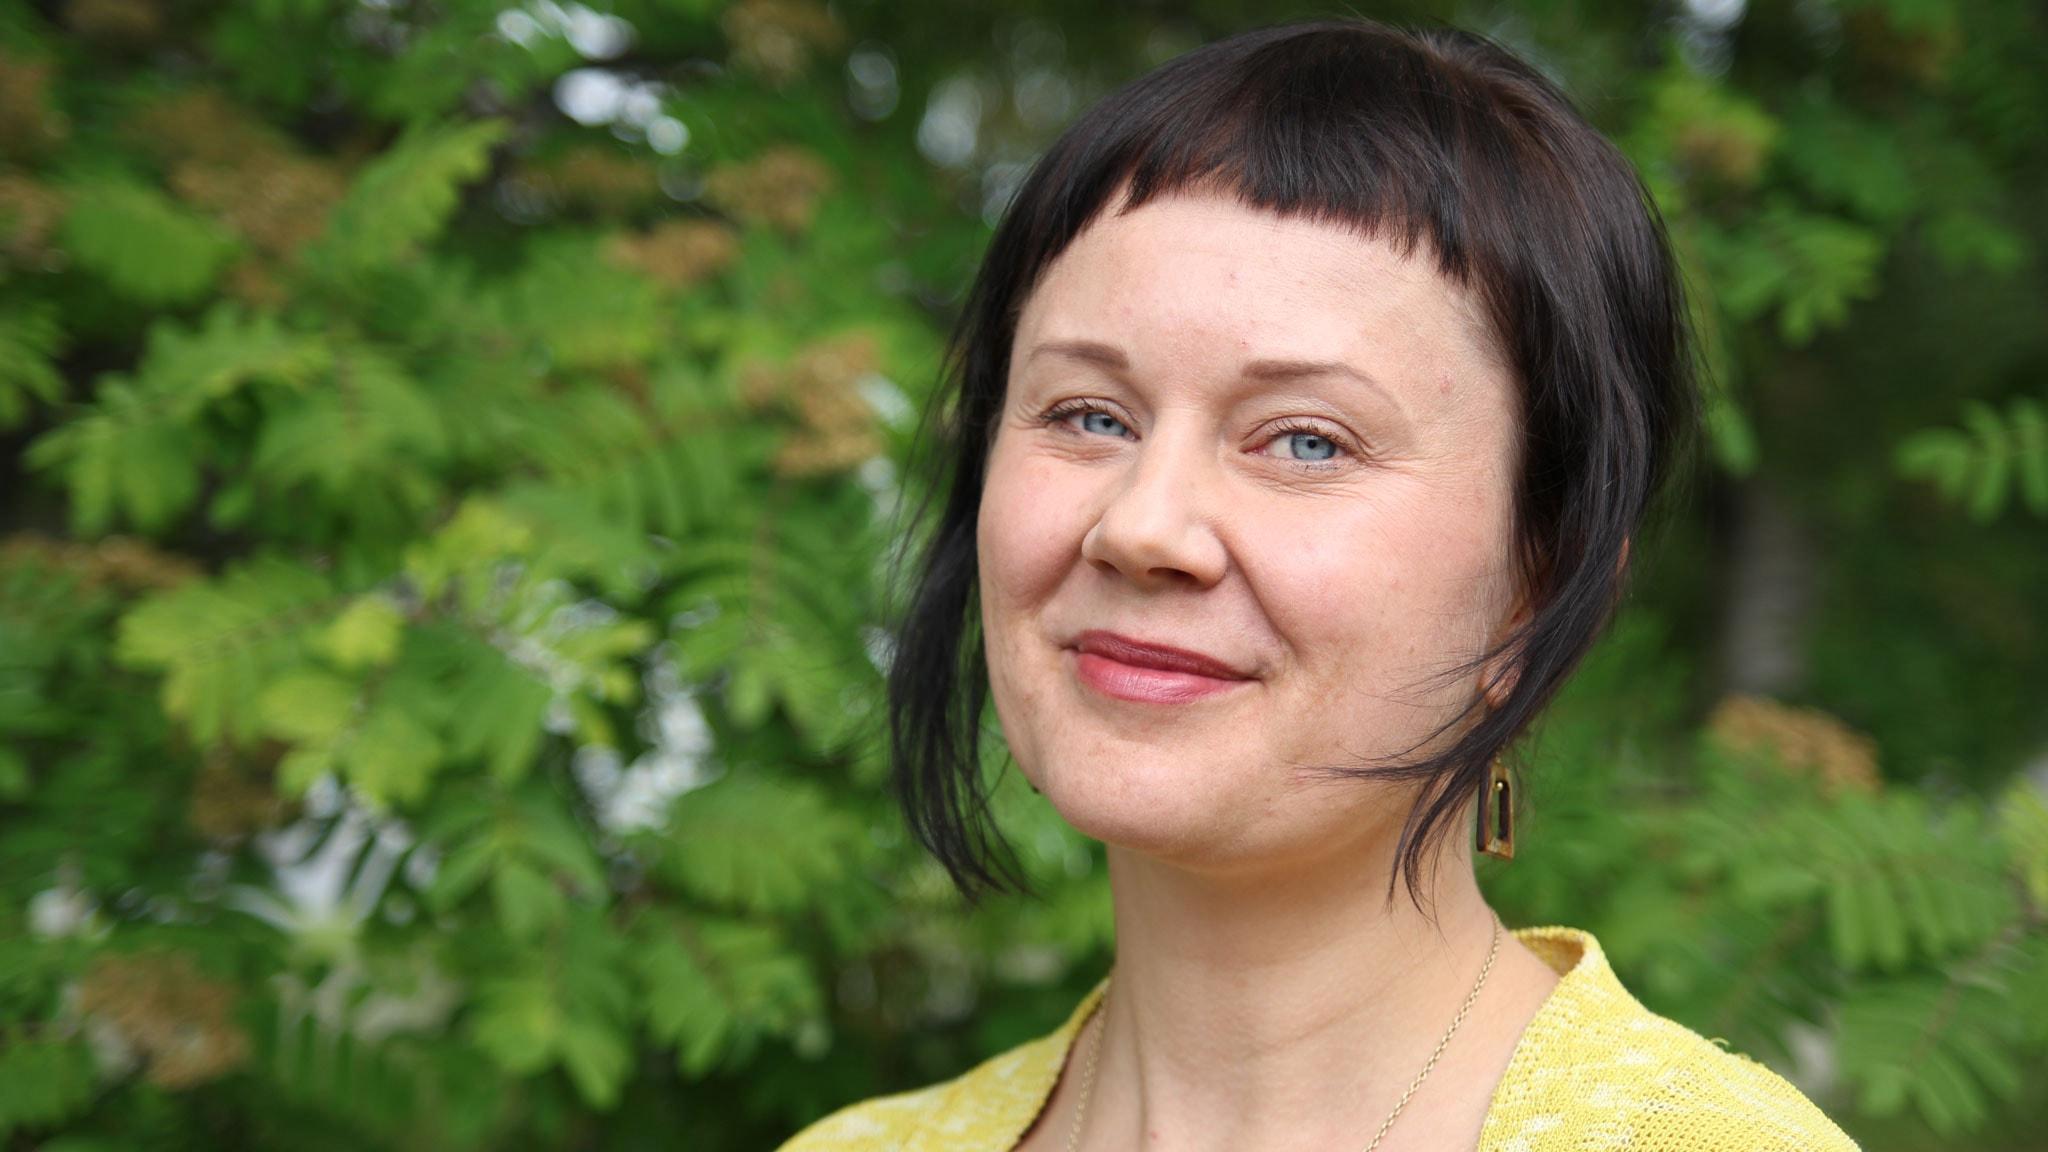 Vila i morgonens hopp - Susanne Dahl